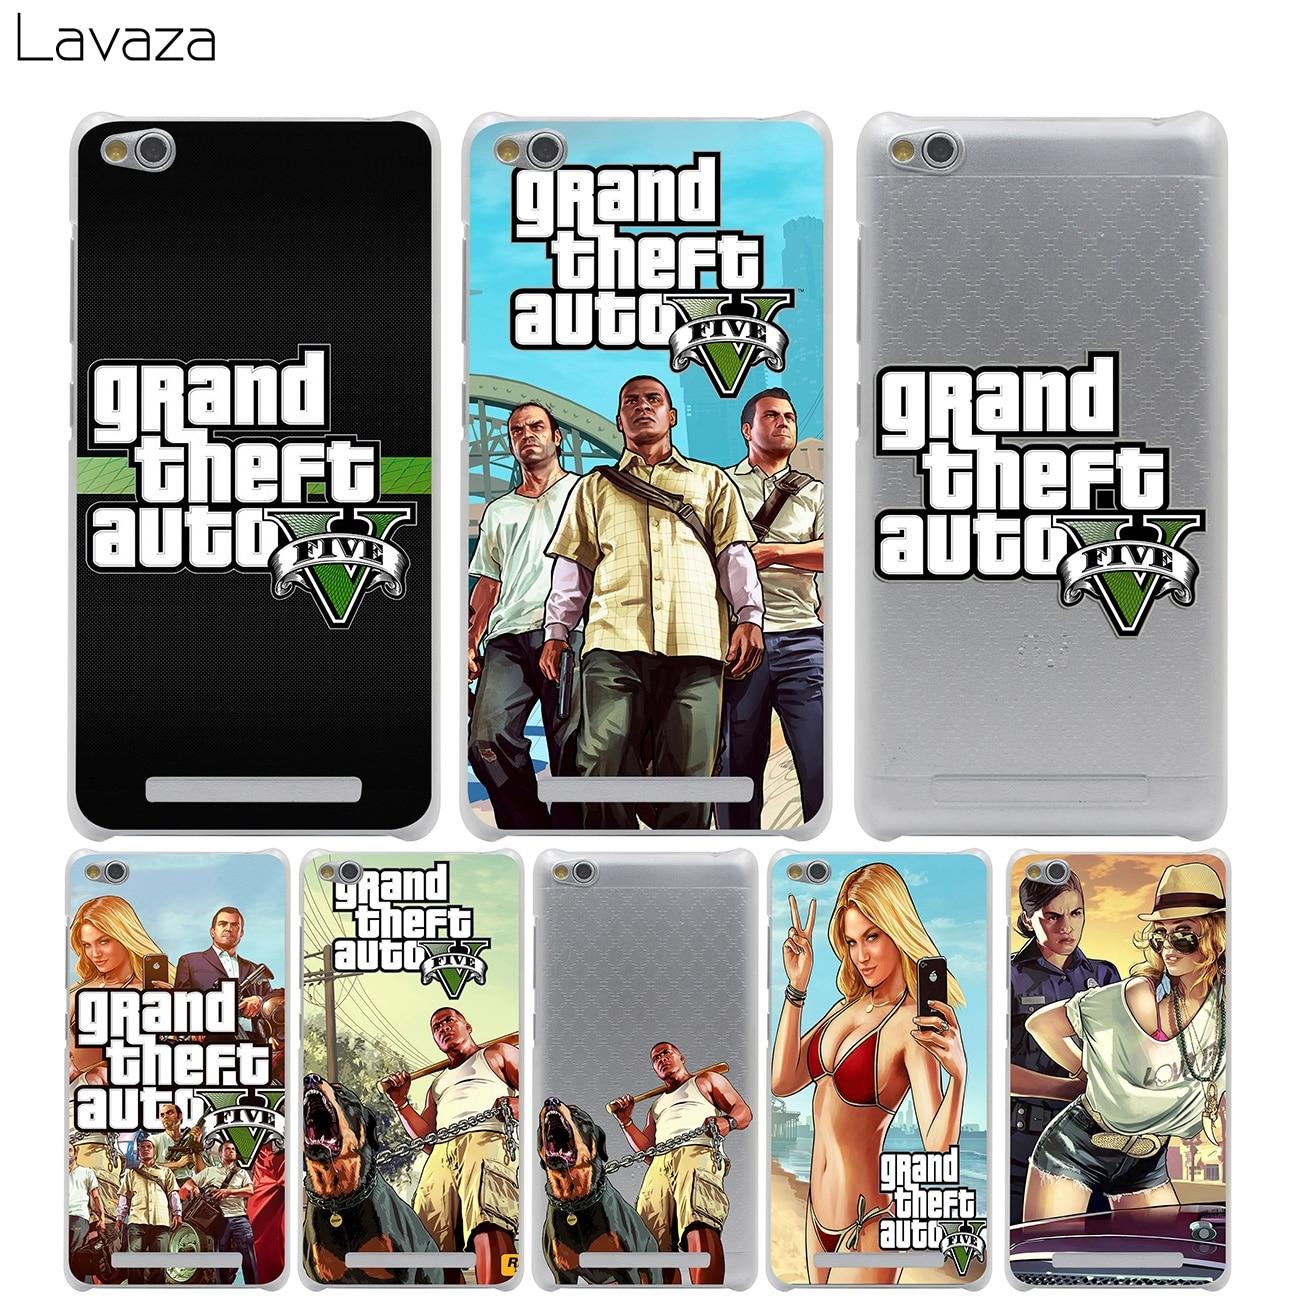 Lavaza Grand Theft Auto GTA V Чехол Для Сяо Mi красный Mi Примечание Mi 3 3 s 4x4 4A A1 5 5A 5S 5x Mi 5 Mi 6 Pro Plus ...